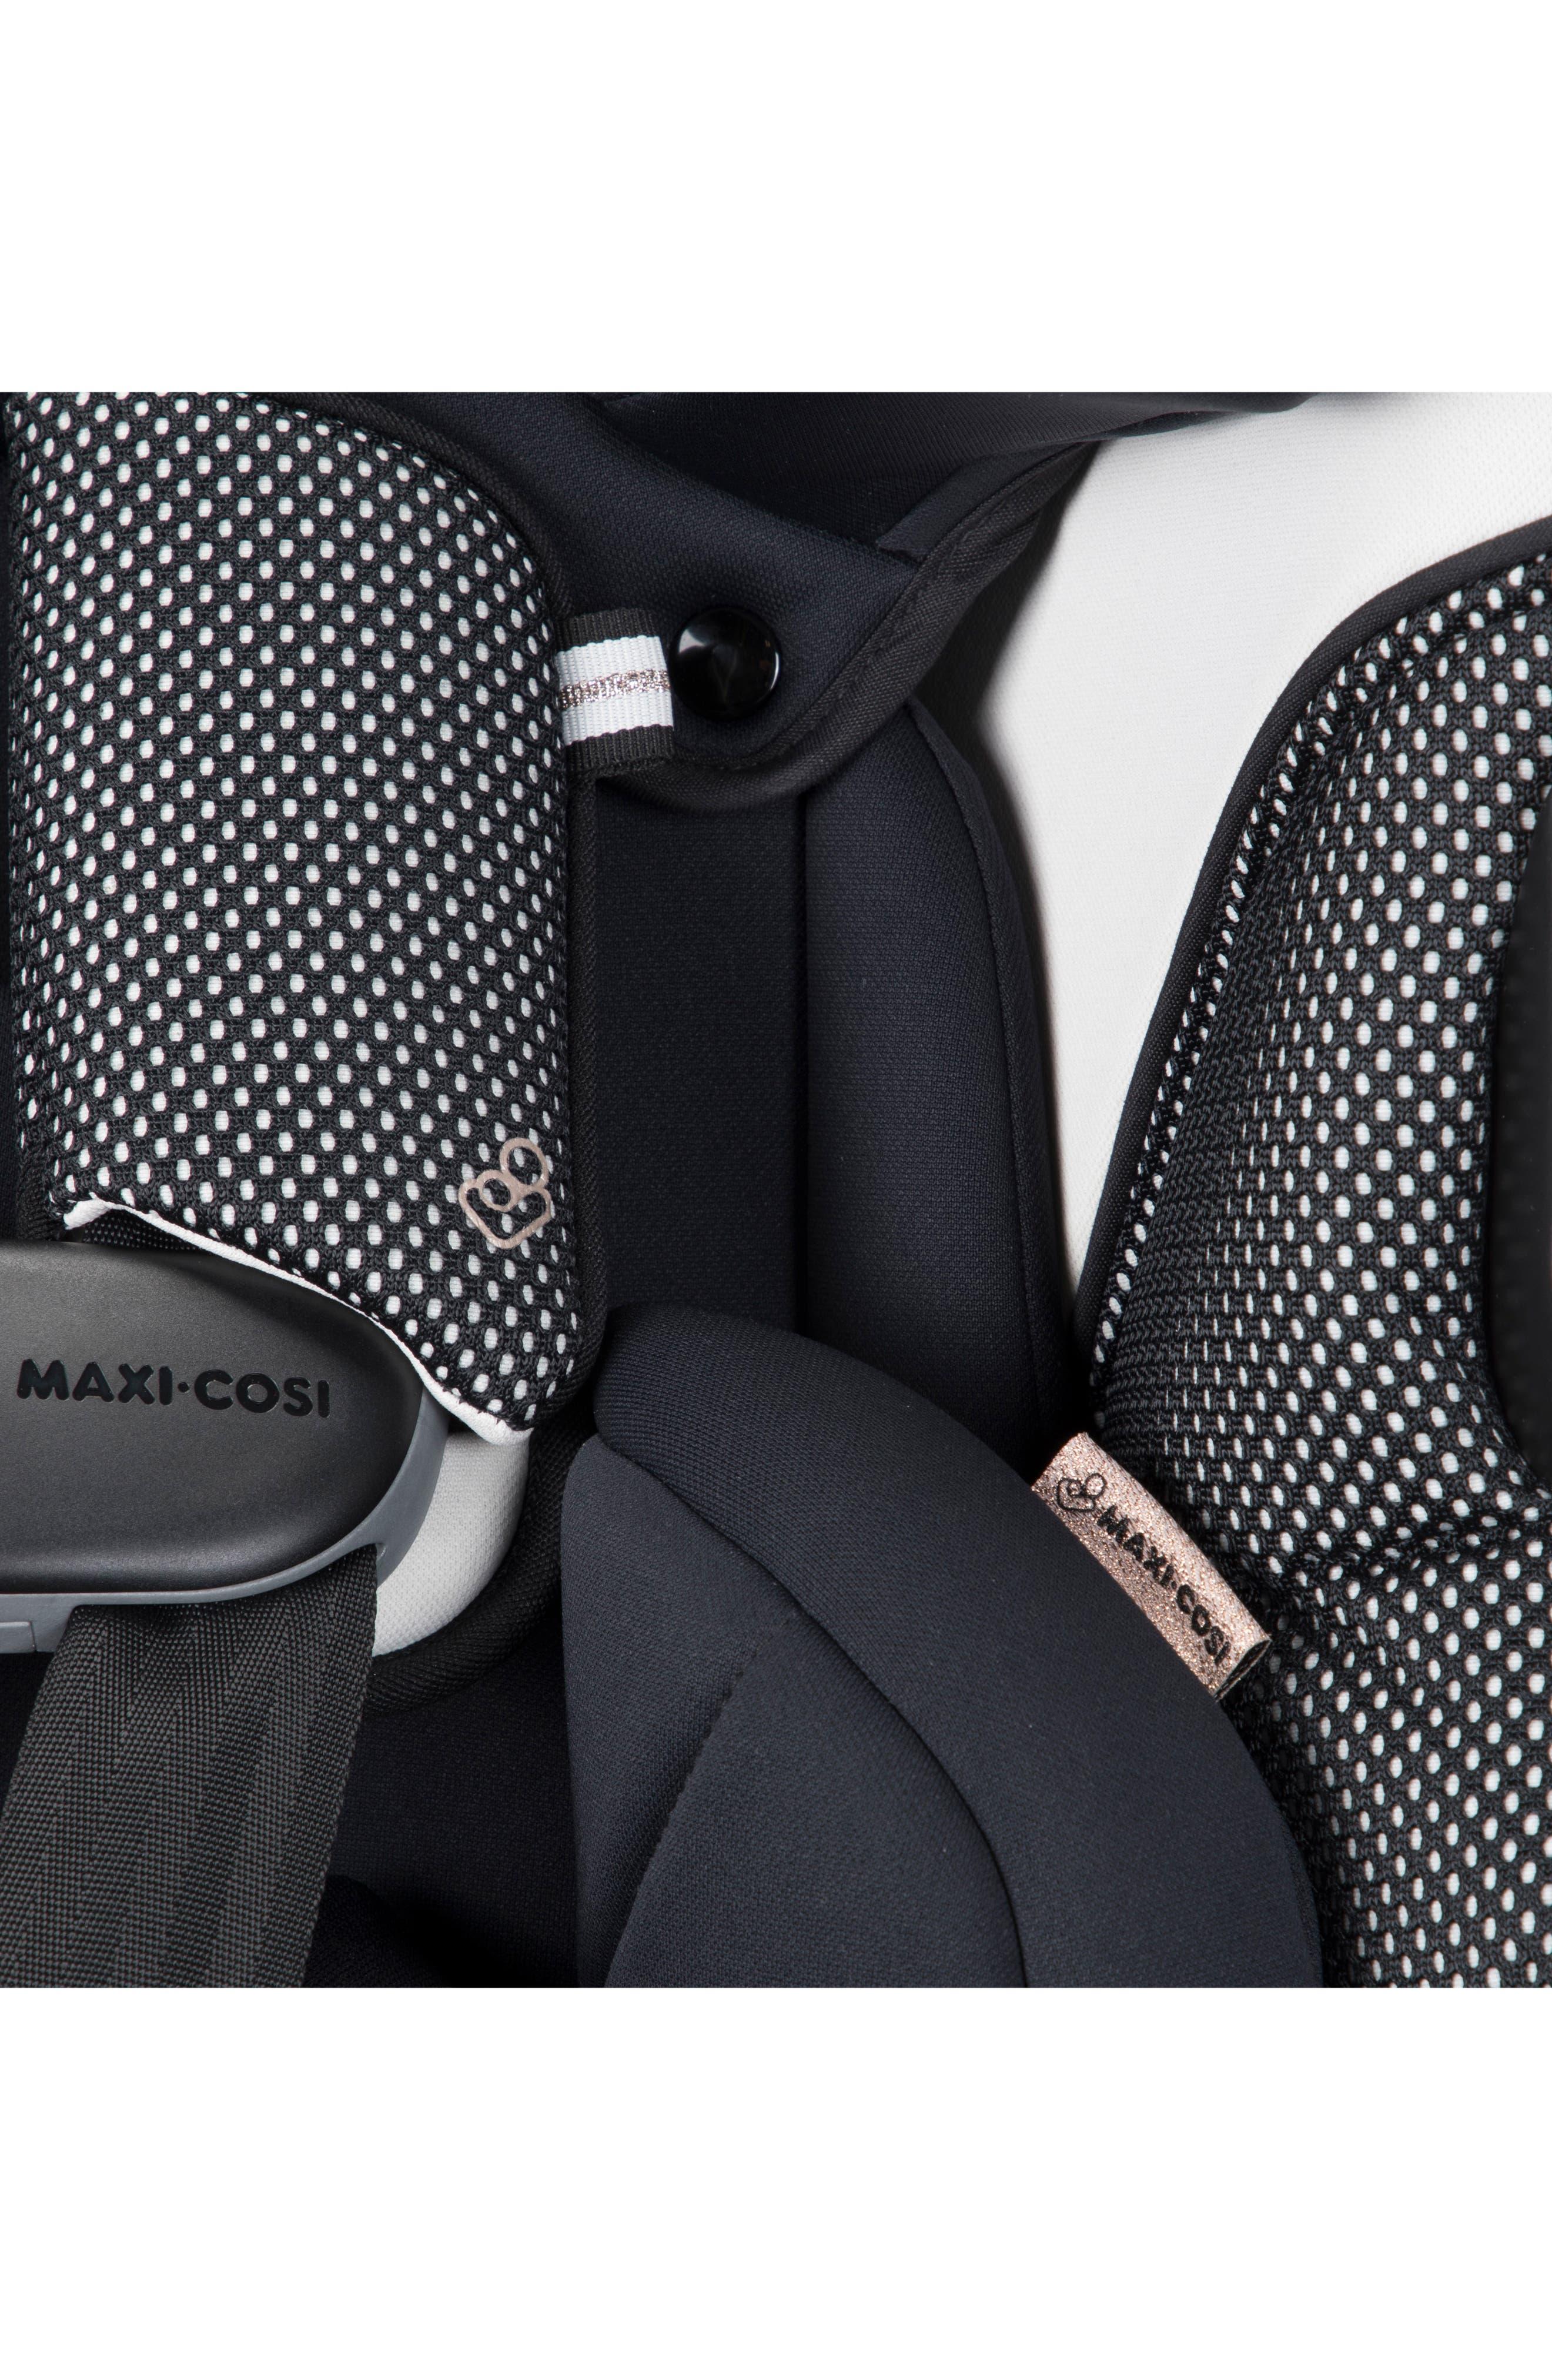 x Rachel Zoe Pria<sup>™</sup> 85 Luxe Sport Max Convertible Car Seat,                             Alternate thumbnail 9, color,                             Rz Luxe Sport